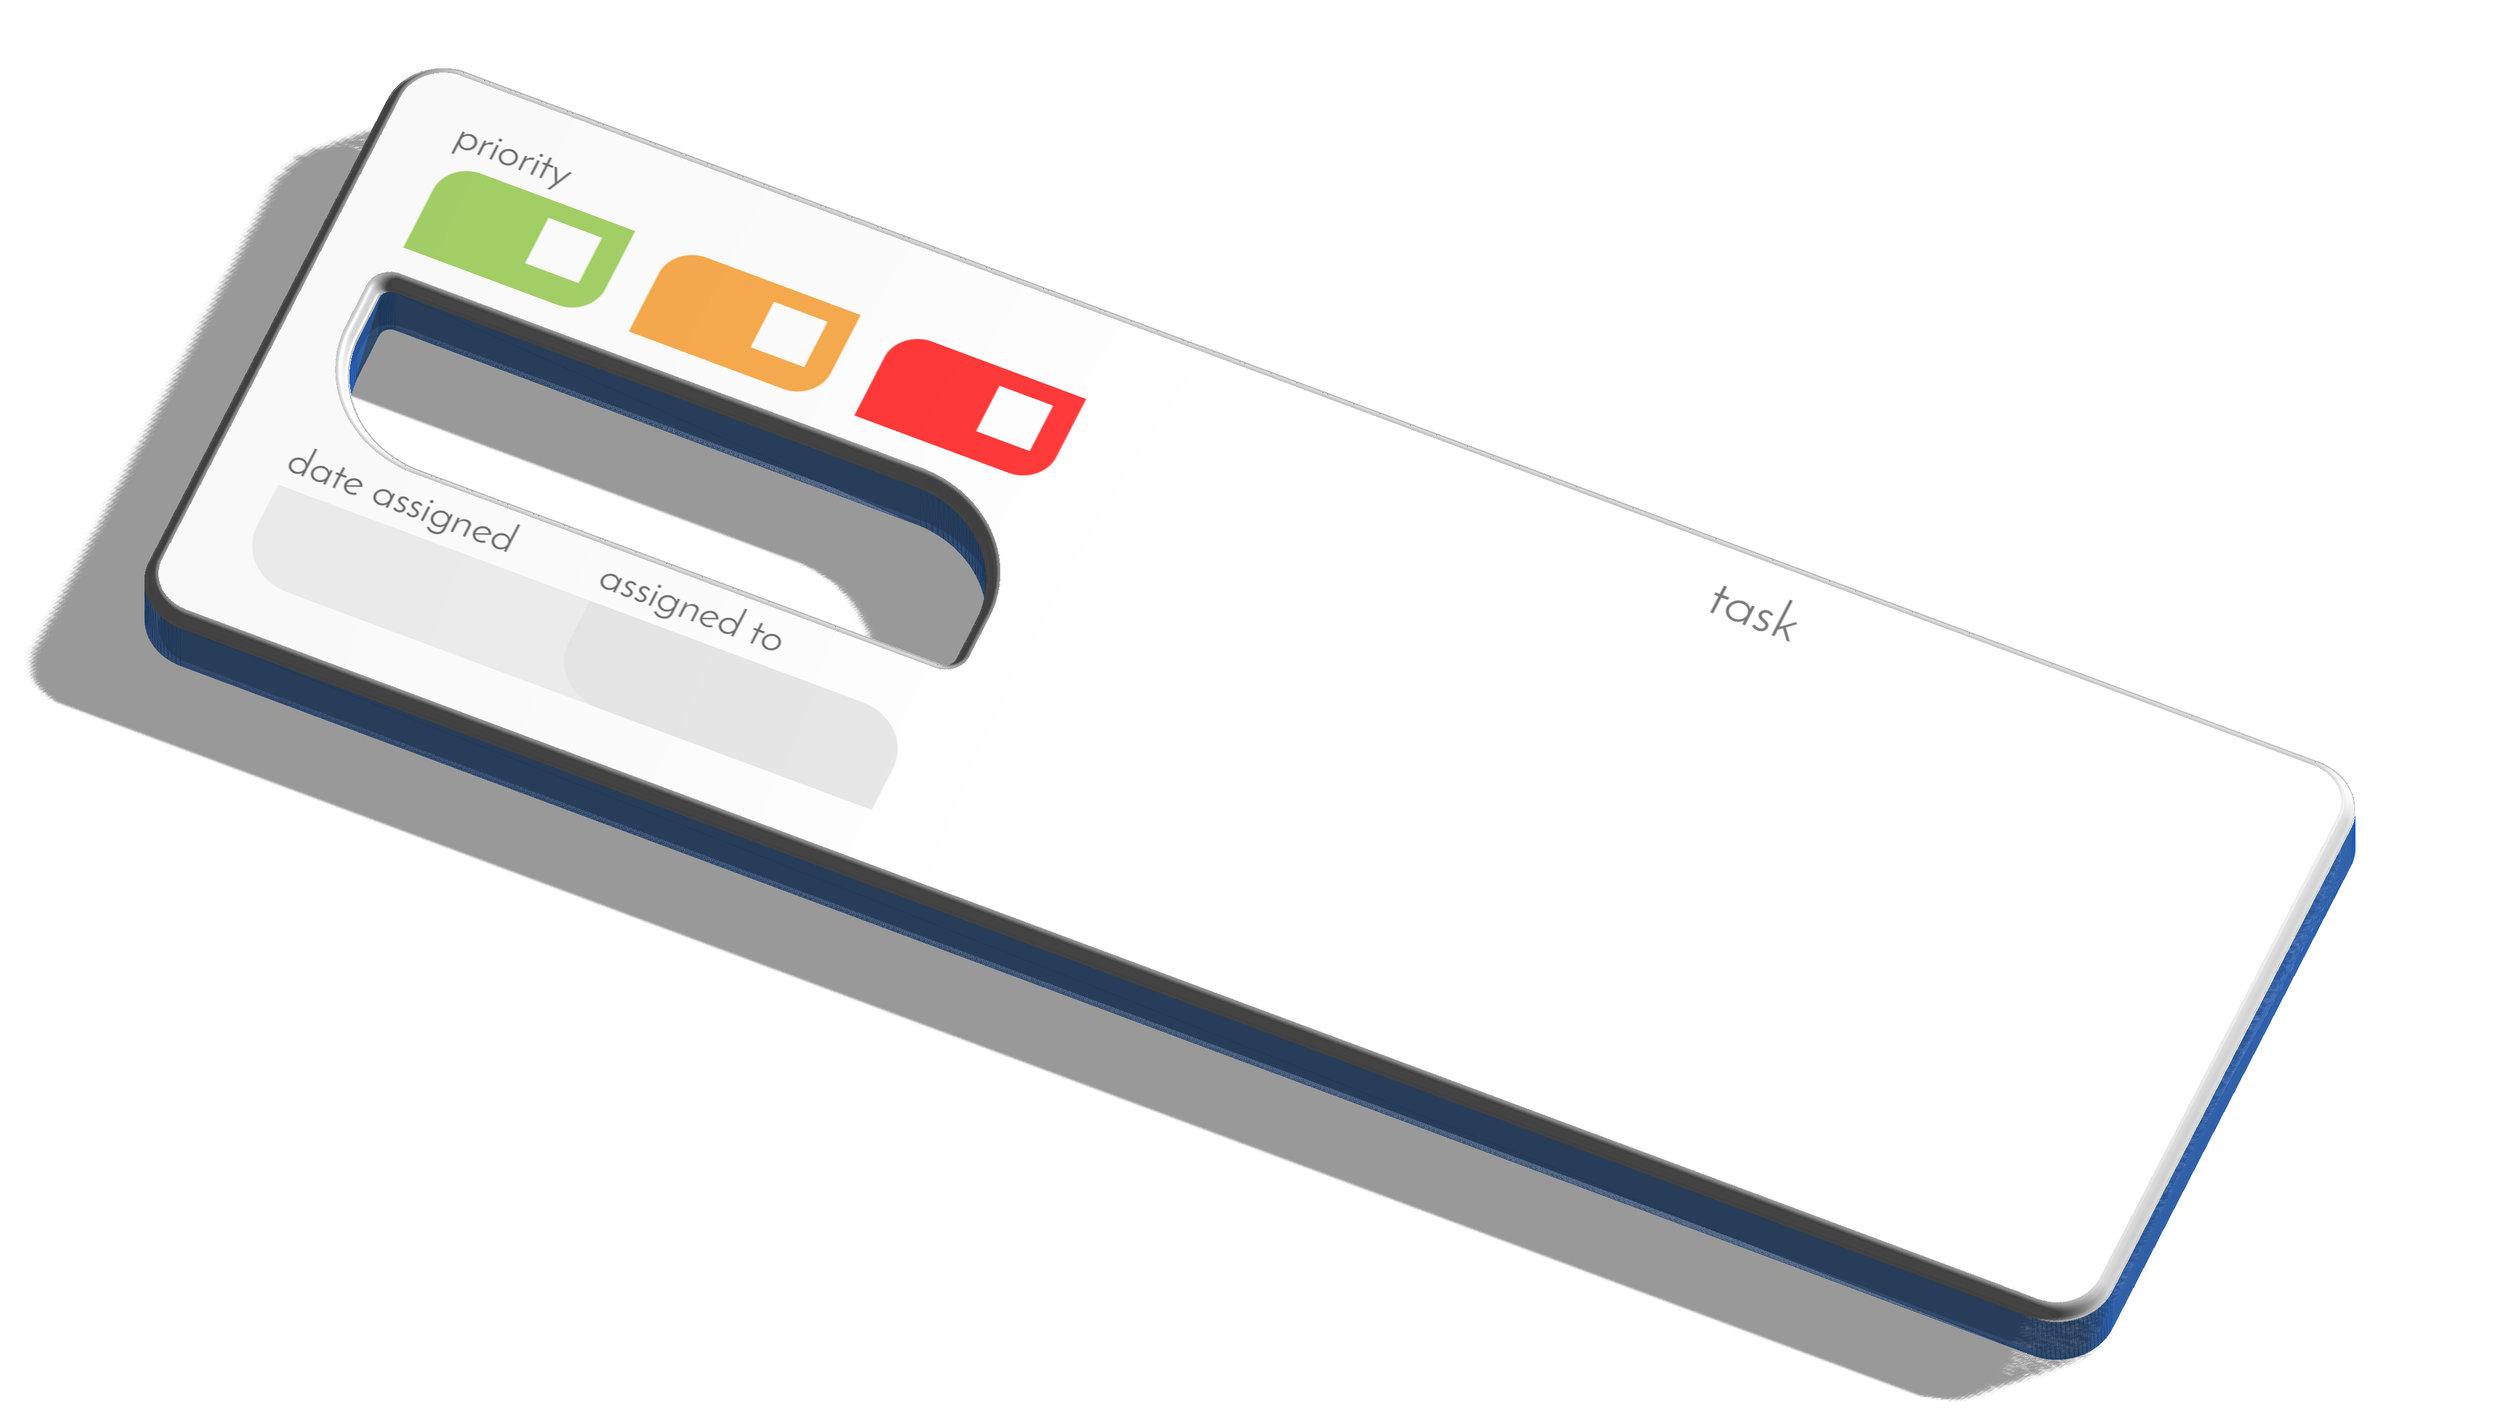 3D render of the Task Baton prototype